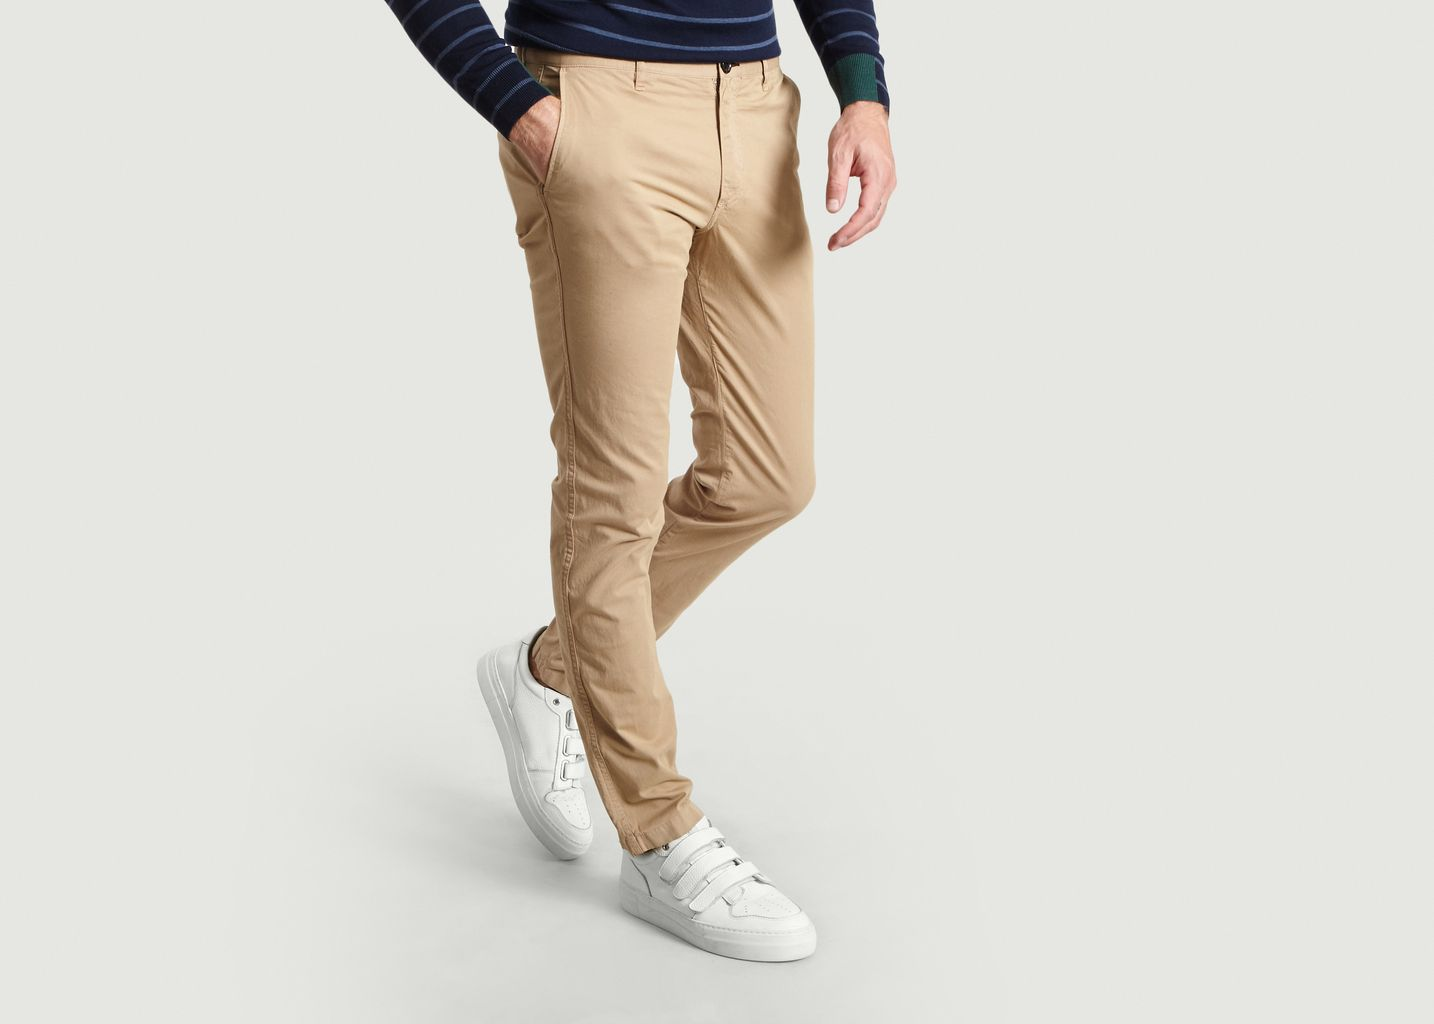 Pantalon Chino Slim - PS by PAUL SMITH